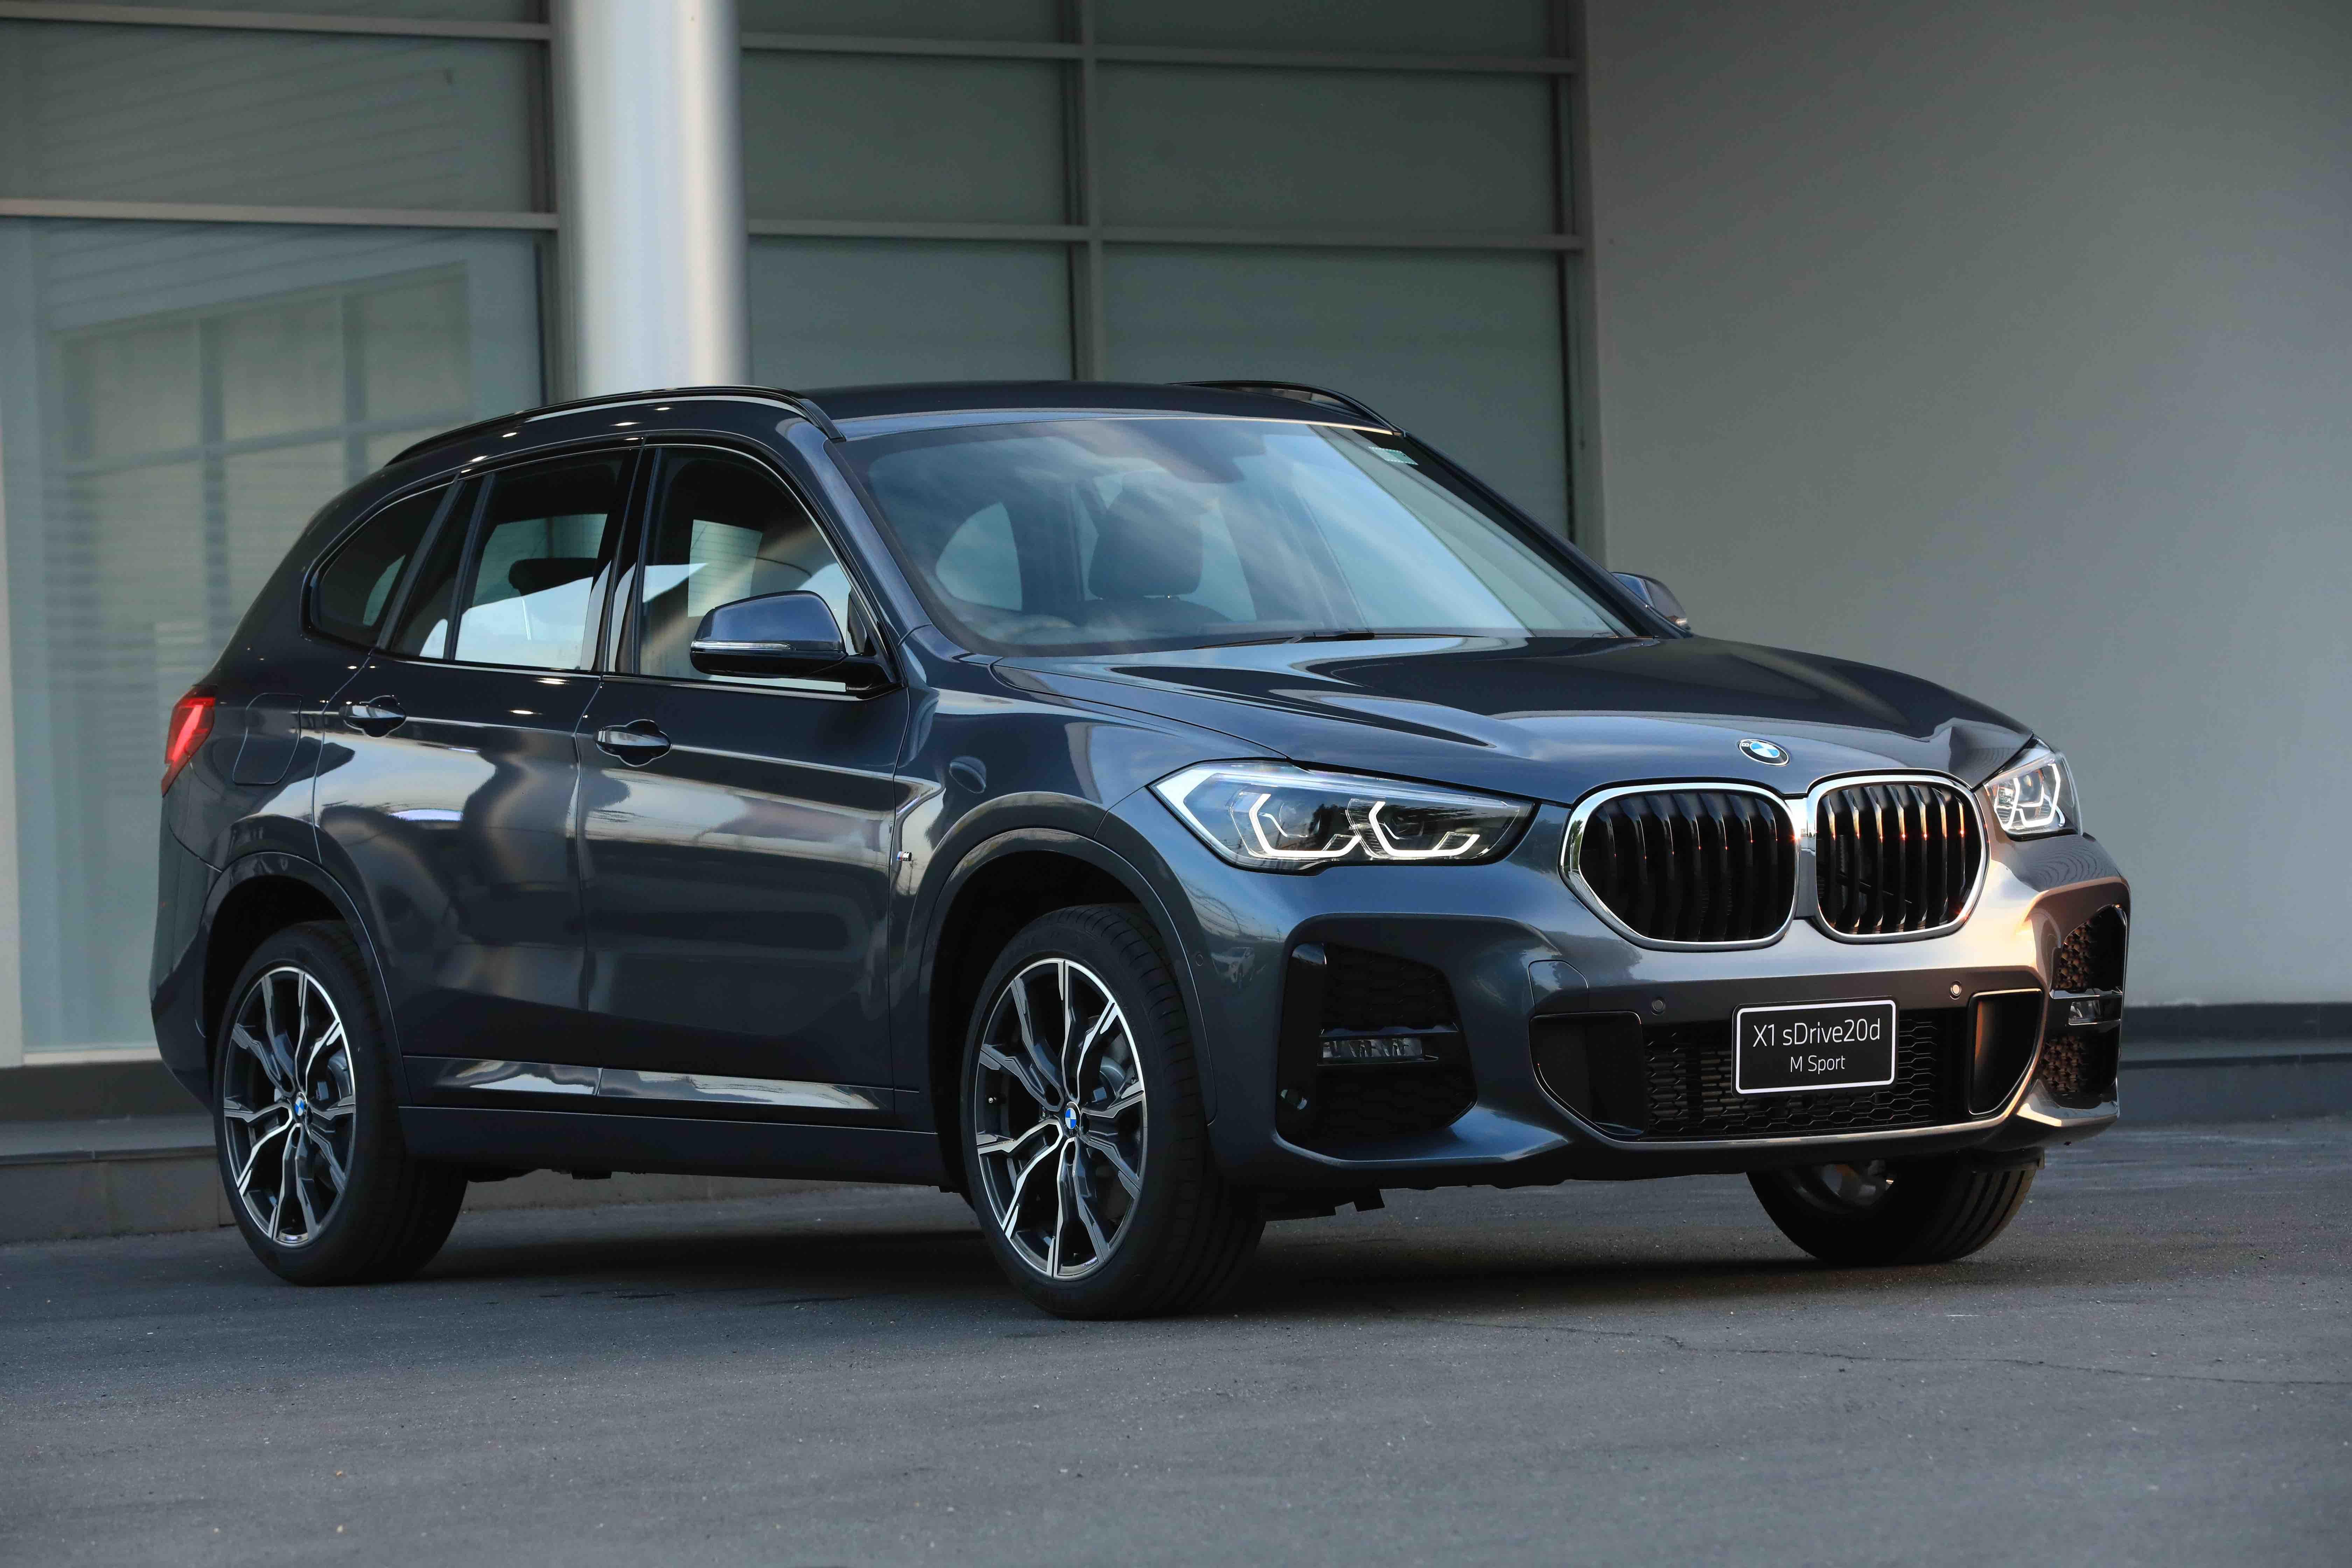 BMW X1 ทุกรุ่นย่อย